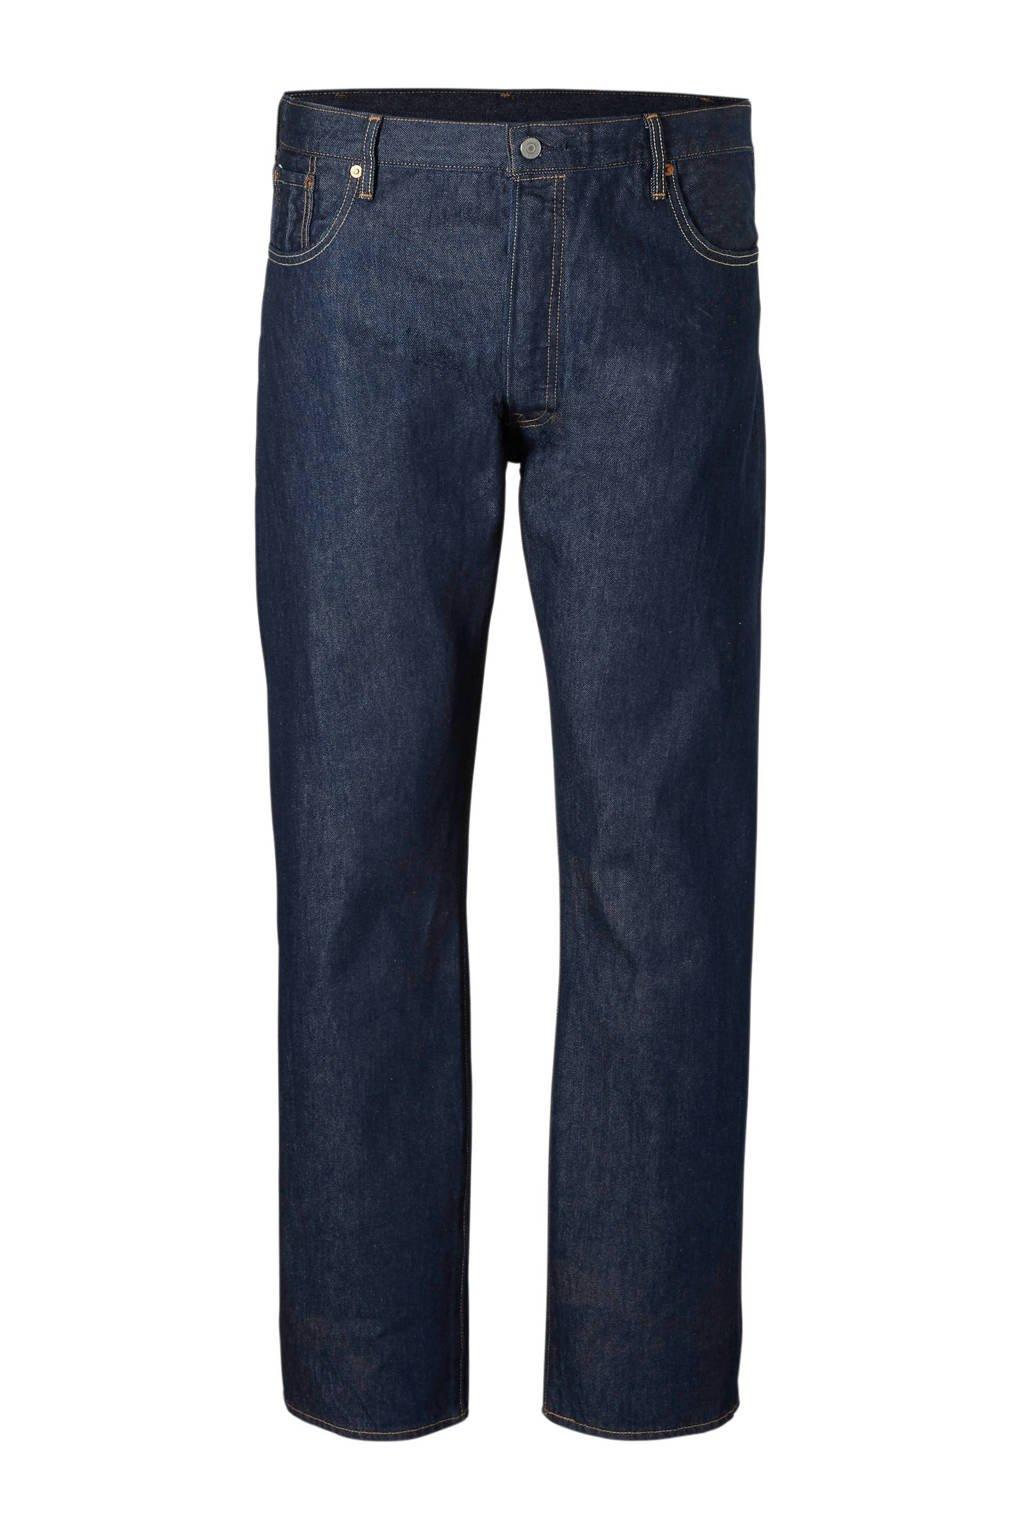 Levi's Big and Tall straight fit jeans 501, Clint Warp